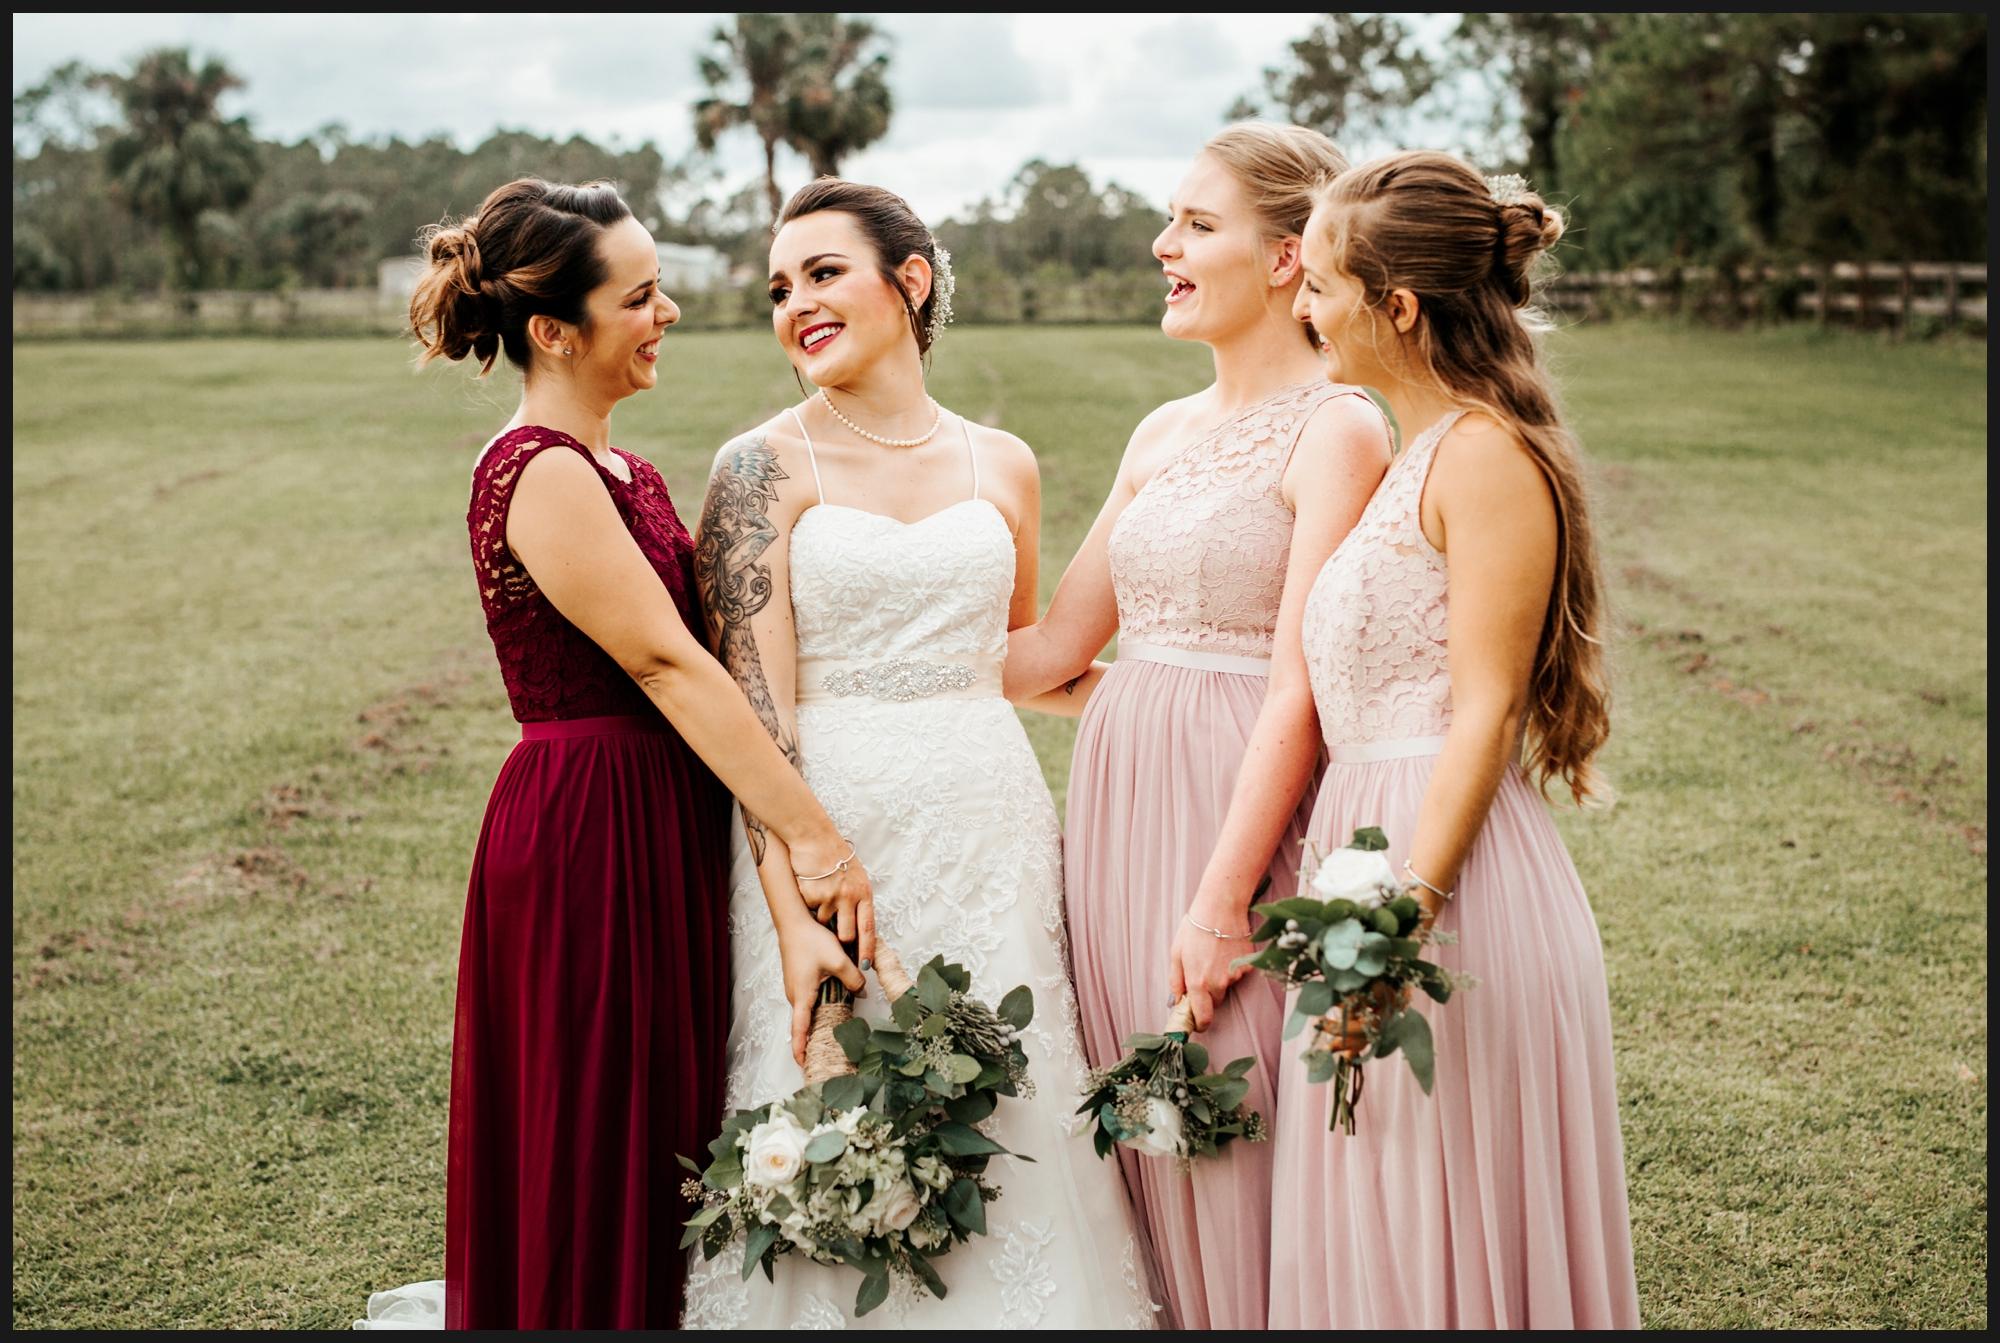 Orlando-Wedding-Photographer-destination-wedding-photographer-florida-wedding-photographer-bohemian-wedding-photographer_0353.jpg